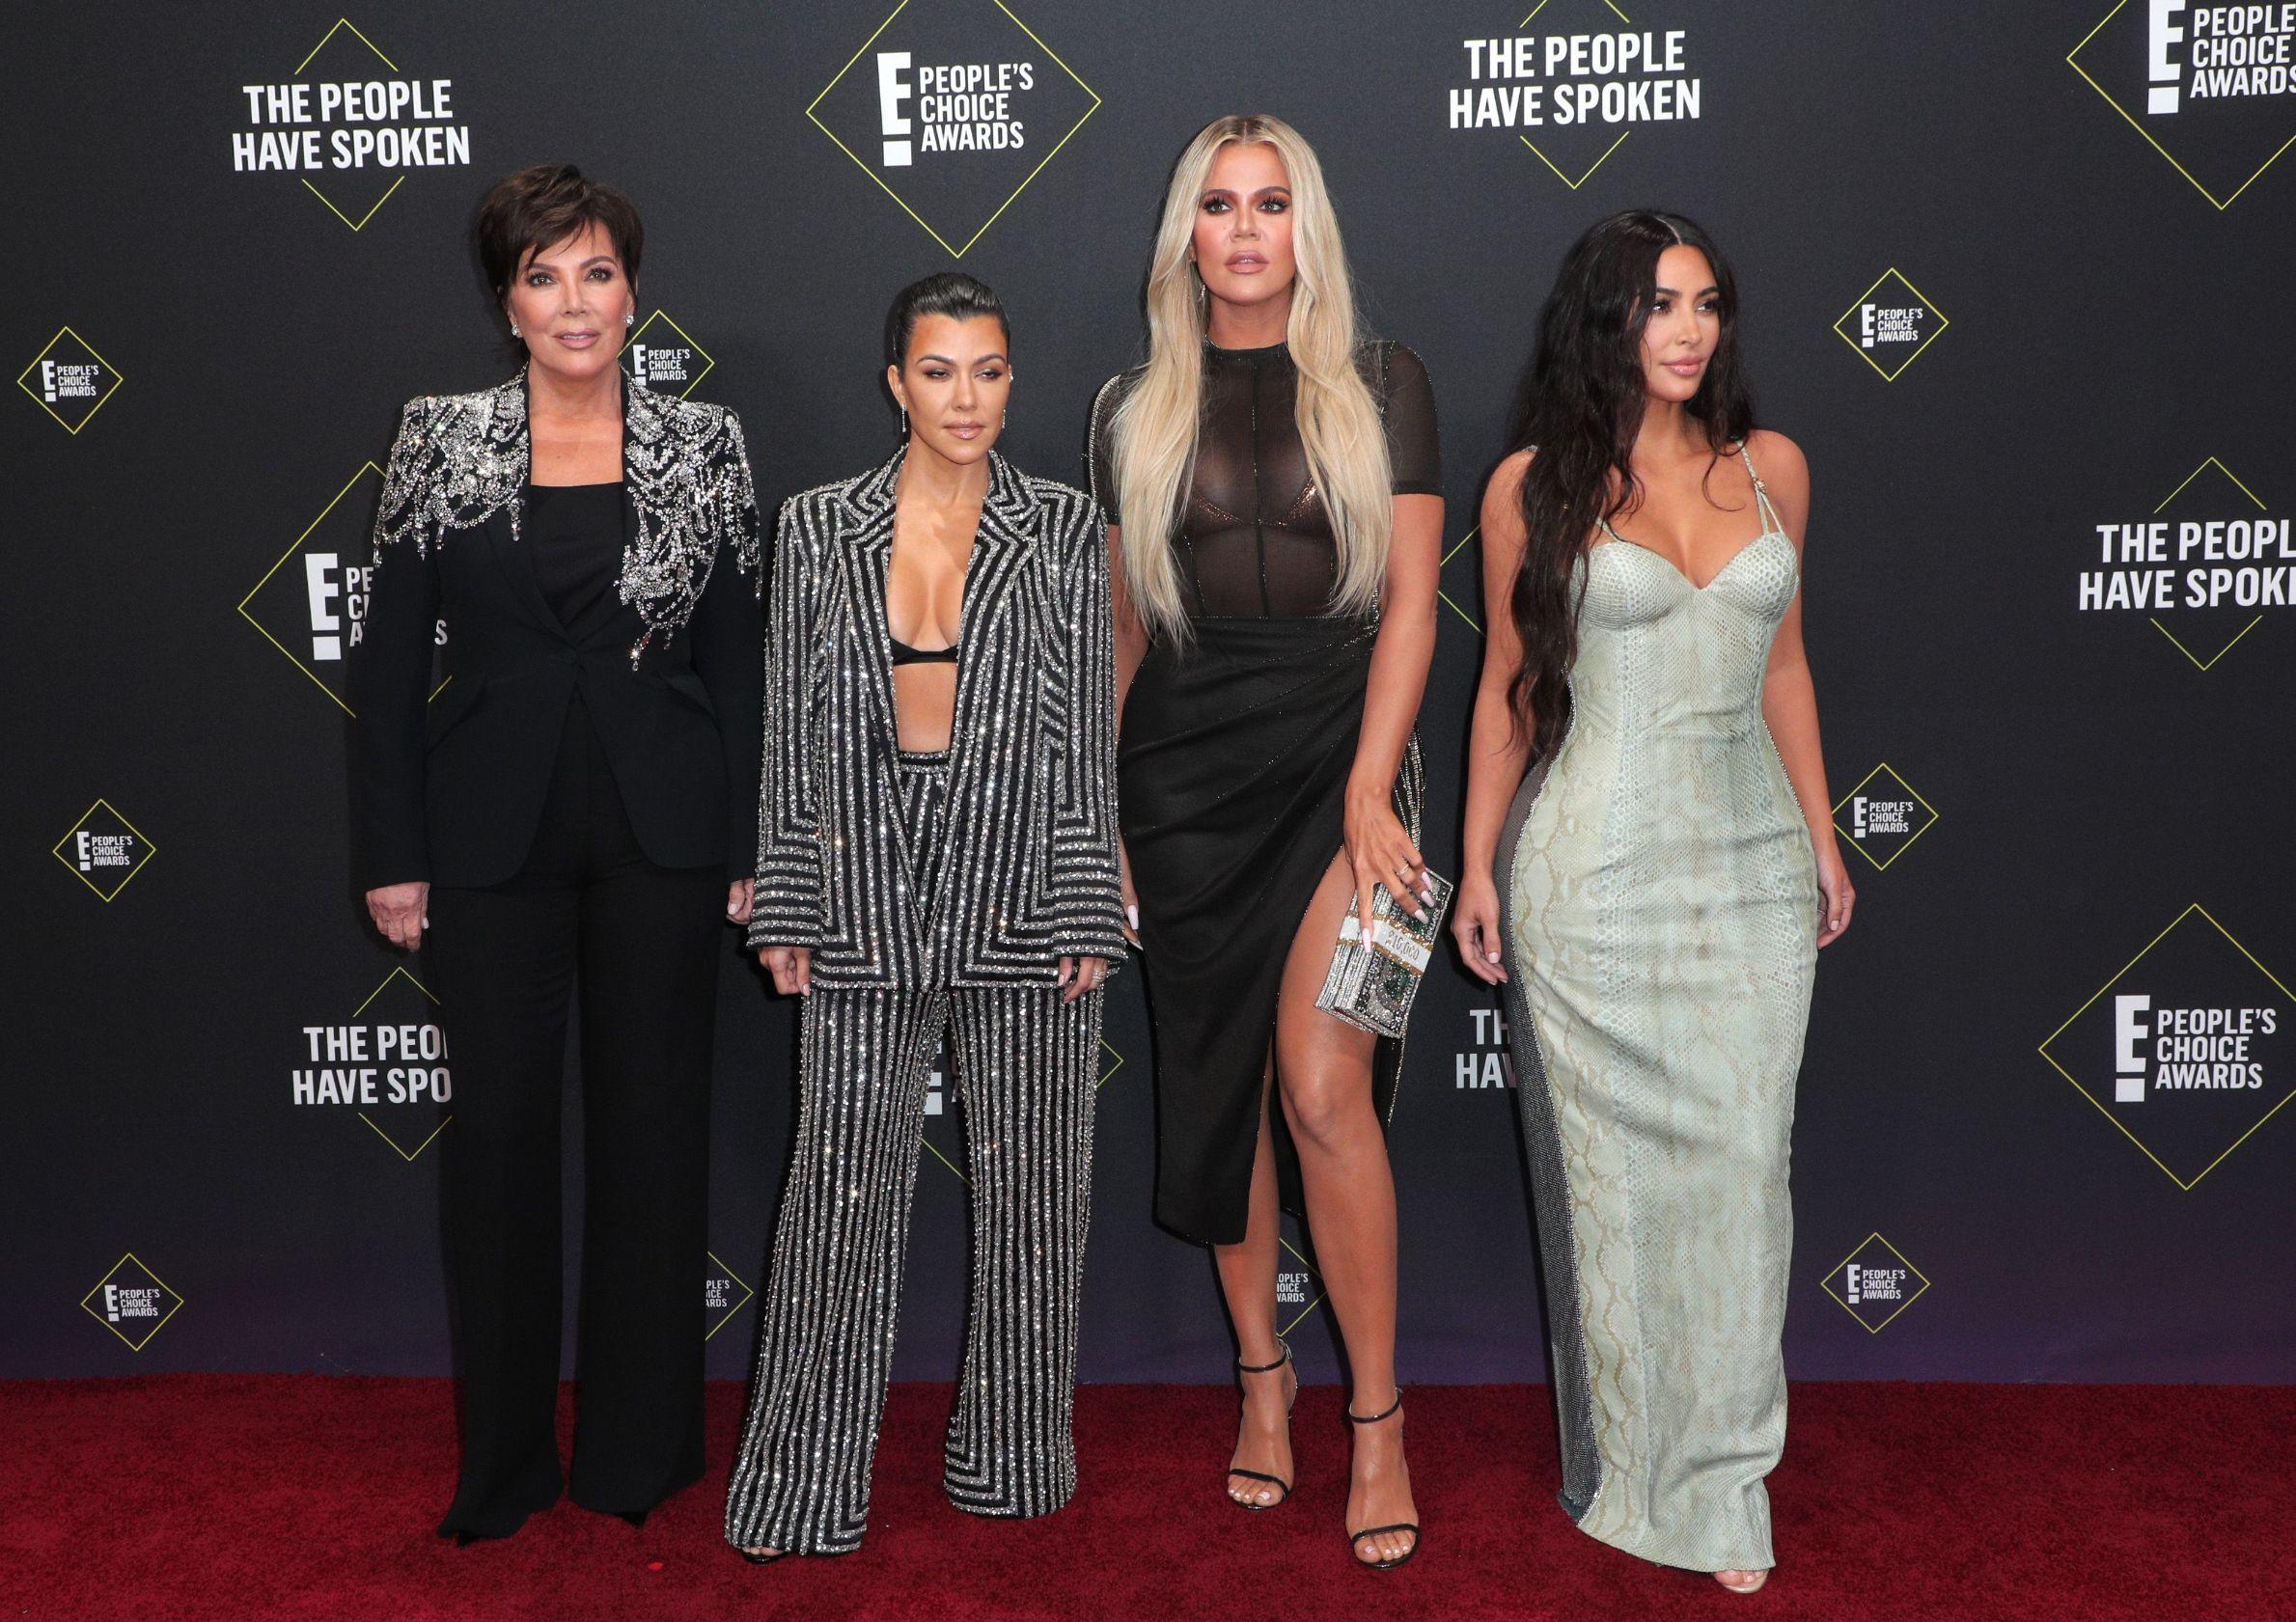 Kris Jenner, Kourtney Kardashian, Khloe Kardashian and Kim Kardashian West 45th Annual People's Choice Awards, Arrivals, Barker Hanger, Los Angeles, USA - 10 Nov 2019,Image: 482160650, License: Rights-managed, Restrictions: , Model Release: no, Credit line: John Salangsang / Shutterstock Editorial / Profimedia